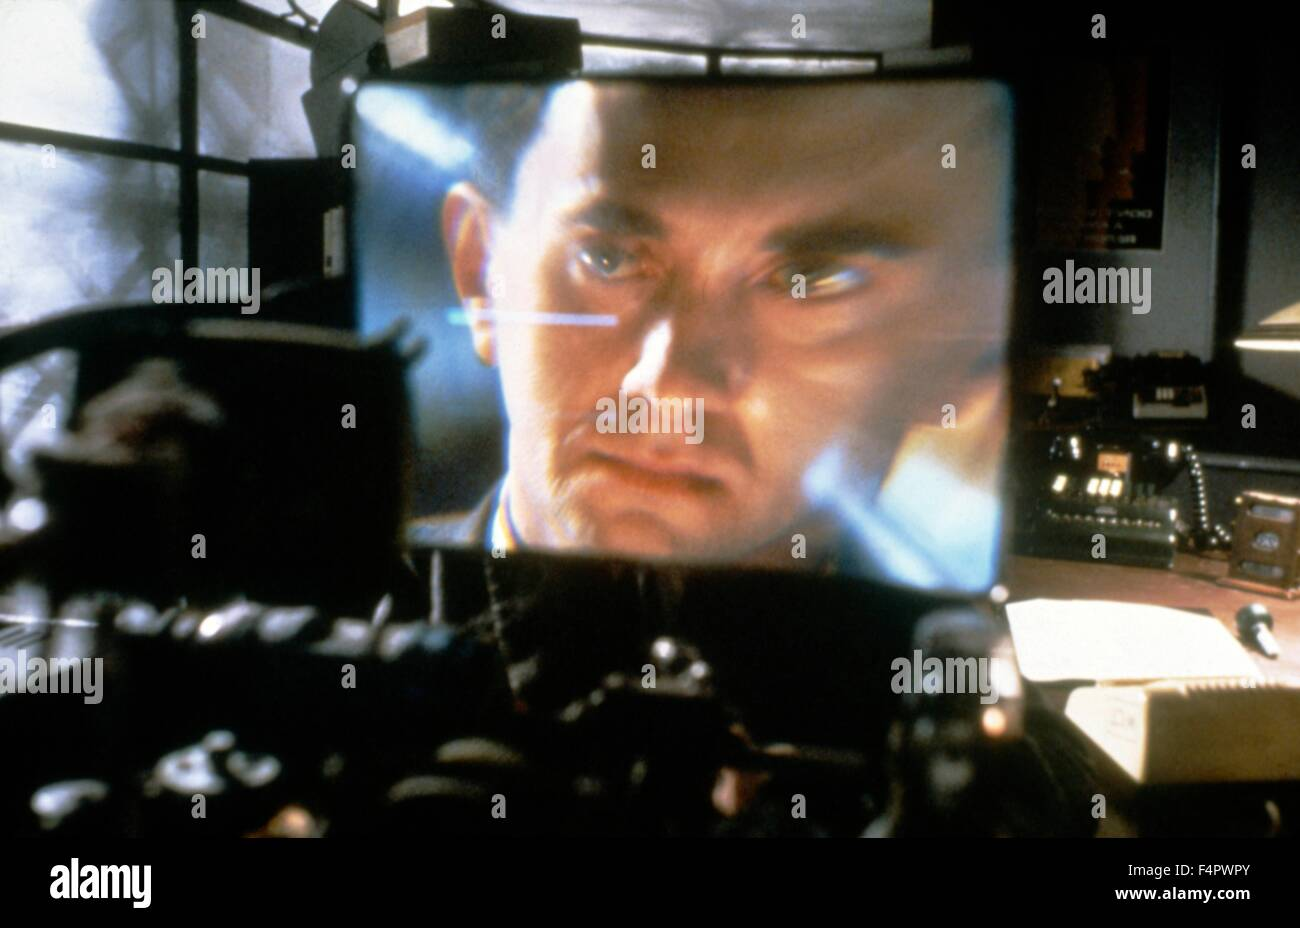 Brasile / 1985 diretto da Terry Gilliam [Embassy International Pictures] Immagini Stock